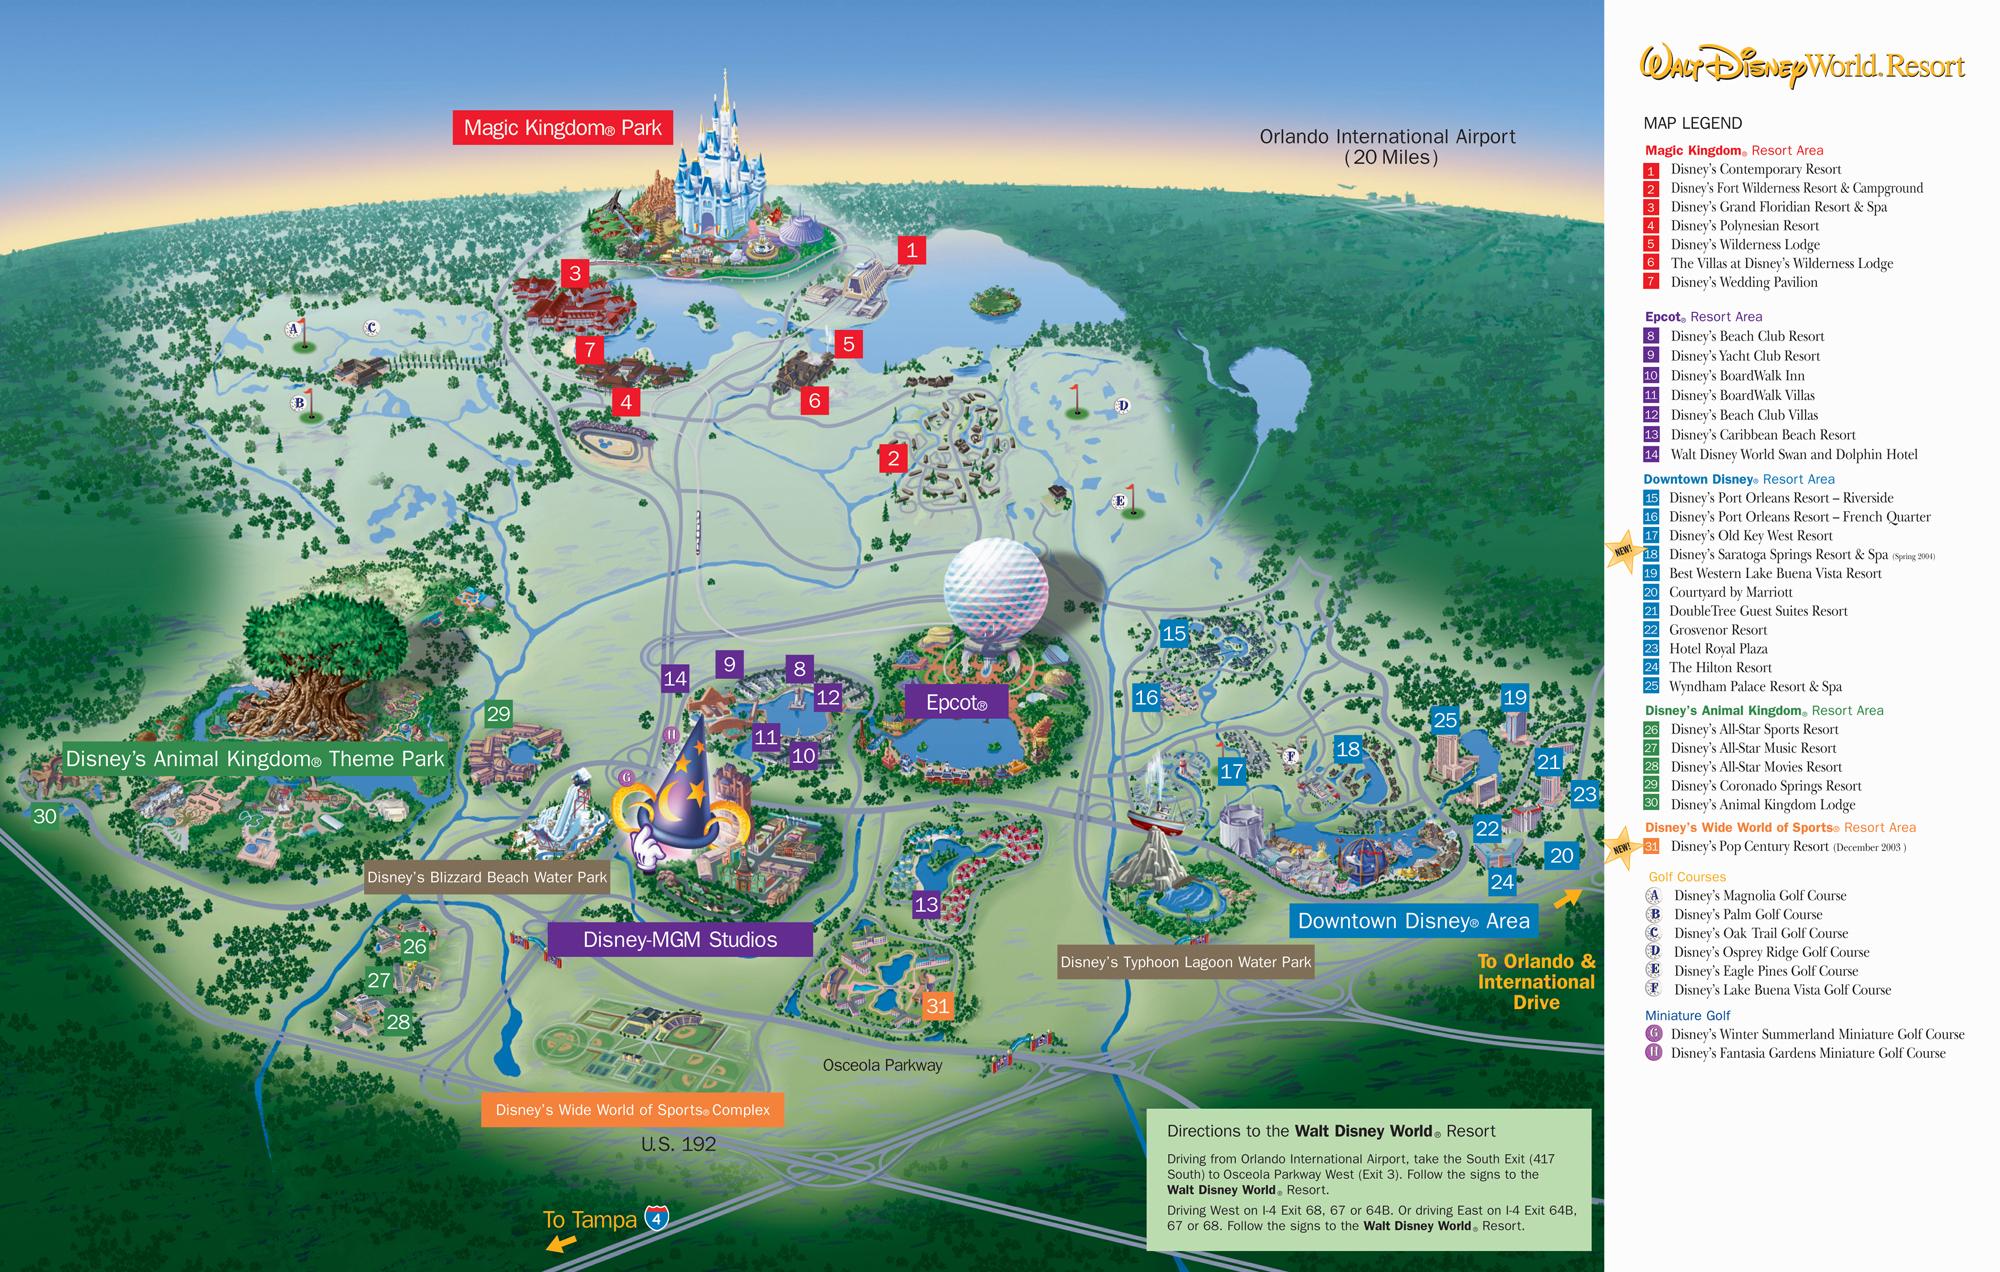 Disney World Florida Map From Mappery 4 - Ameliabd - Disney Orlando Florida Map